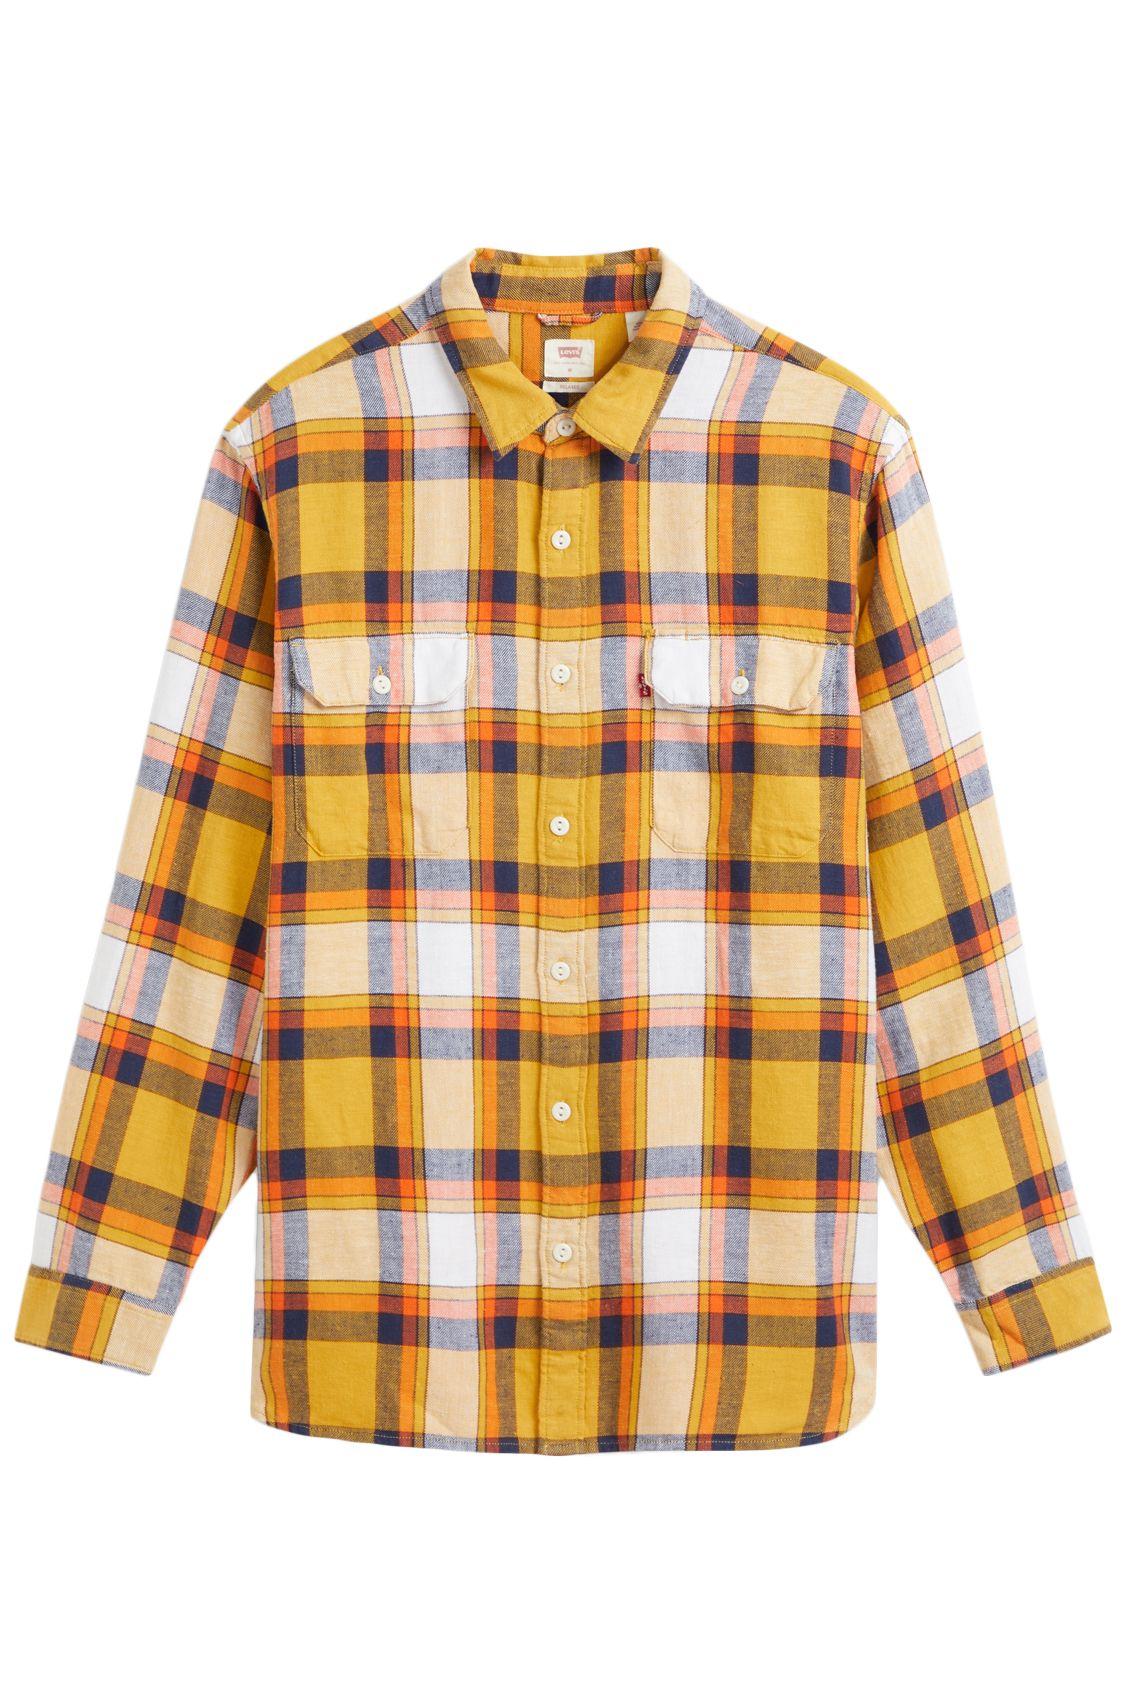 Levis Shirt JACKSON WORKER Grassquit Cool Yellow